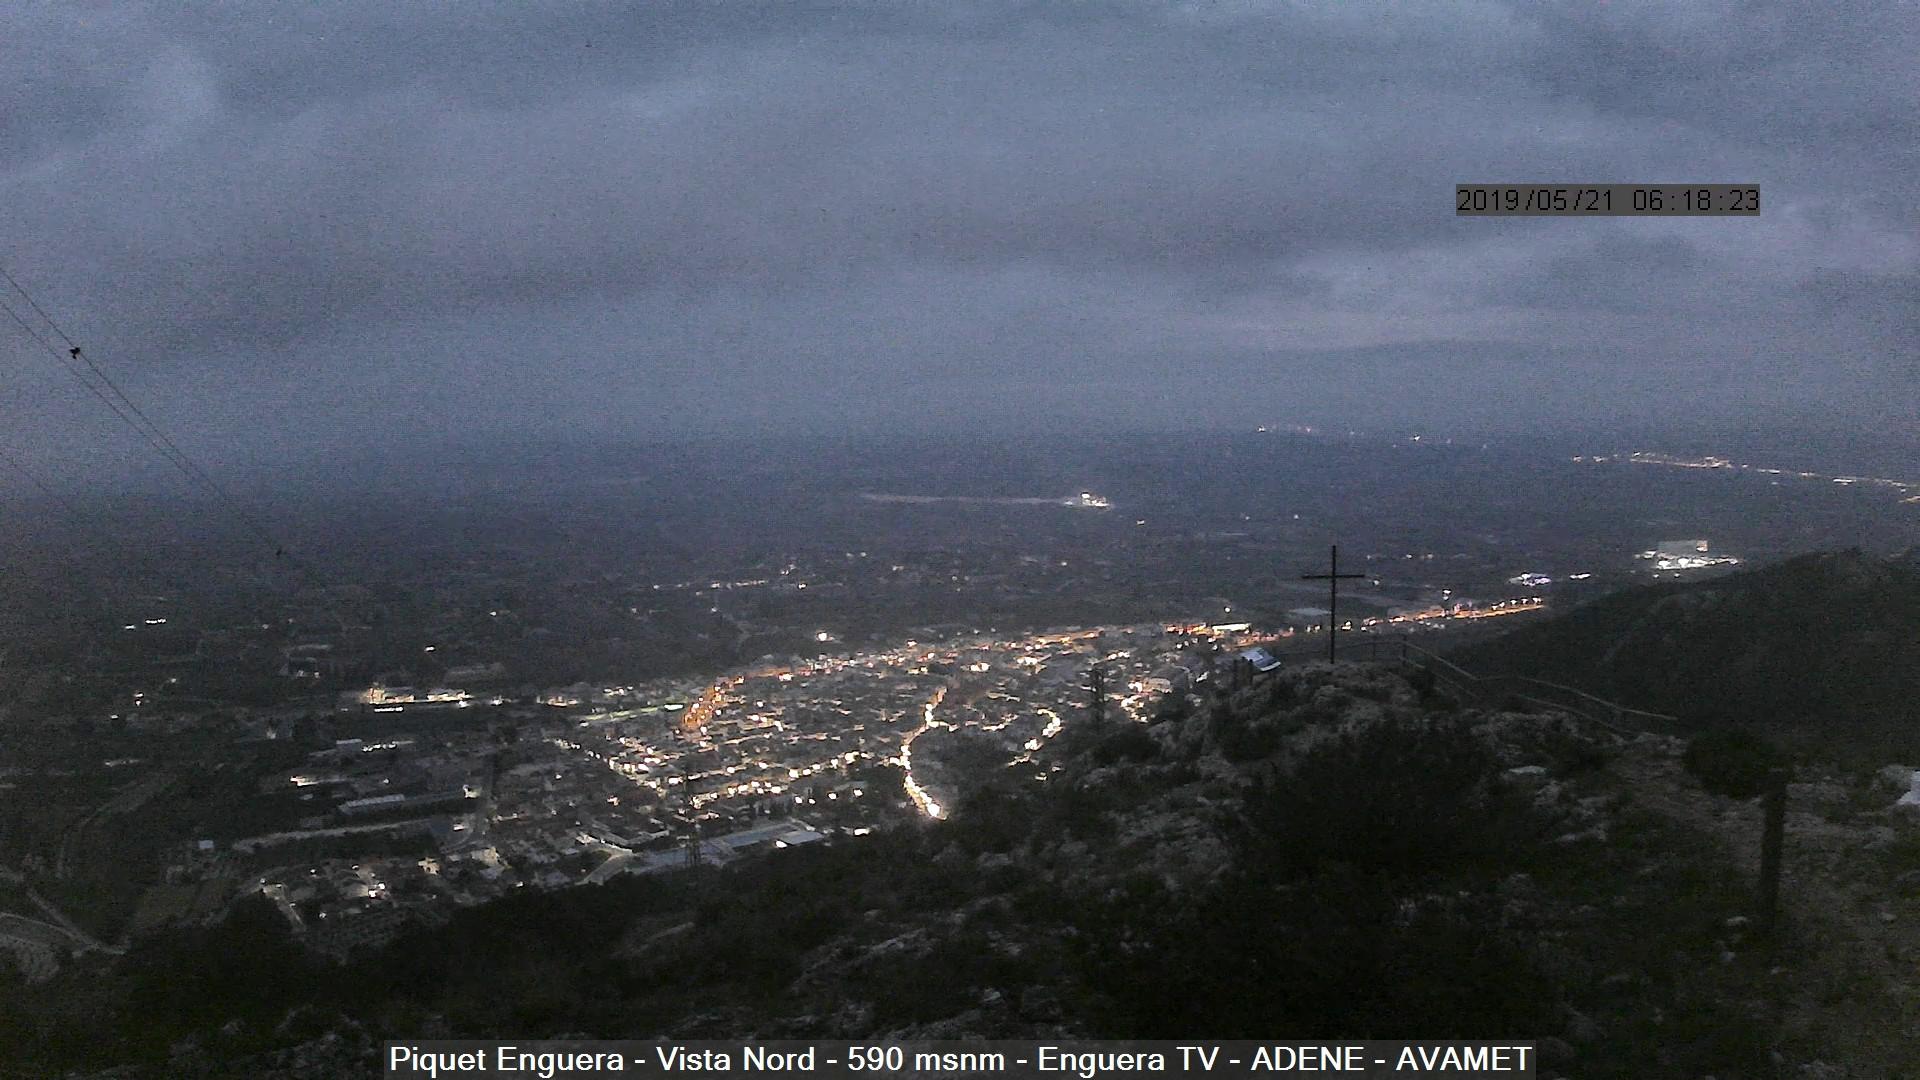 time-lapse frame, TempestEnguera21 webcam